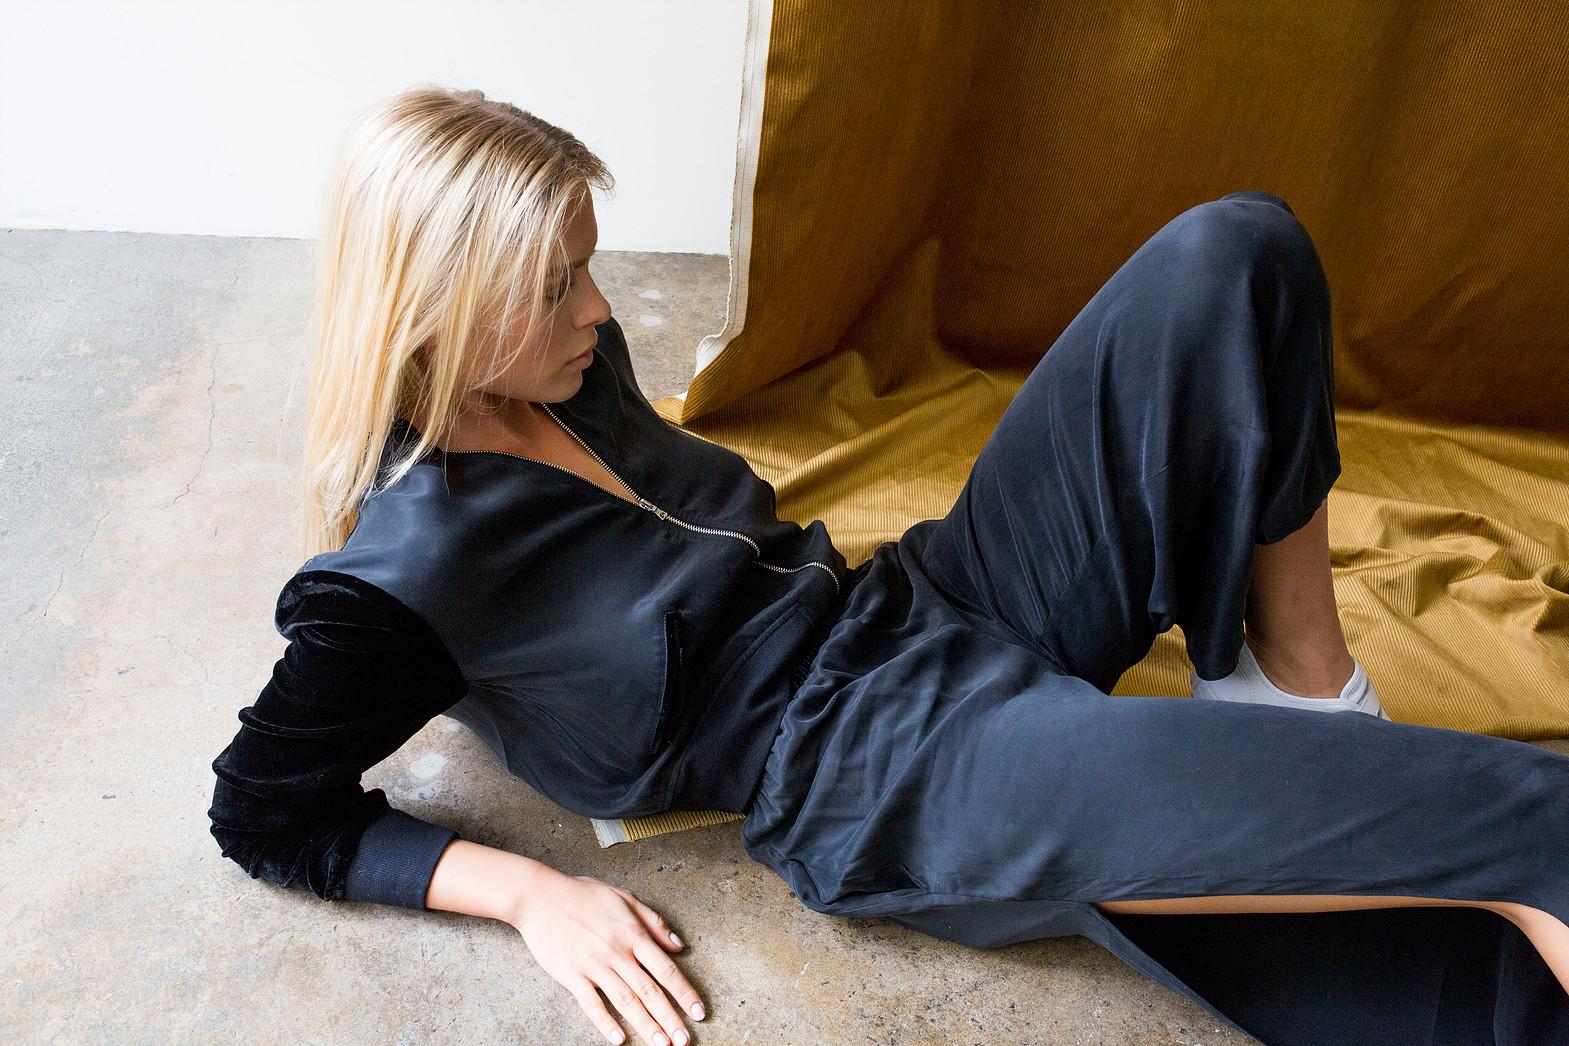 Photographer:  Gareth Davies    Model:  Aria    Hair & Make Up:  Sasha Araujo    Stylist:  Stacey Marie    Brand:  art dept.